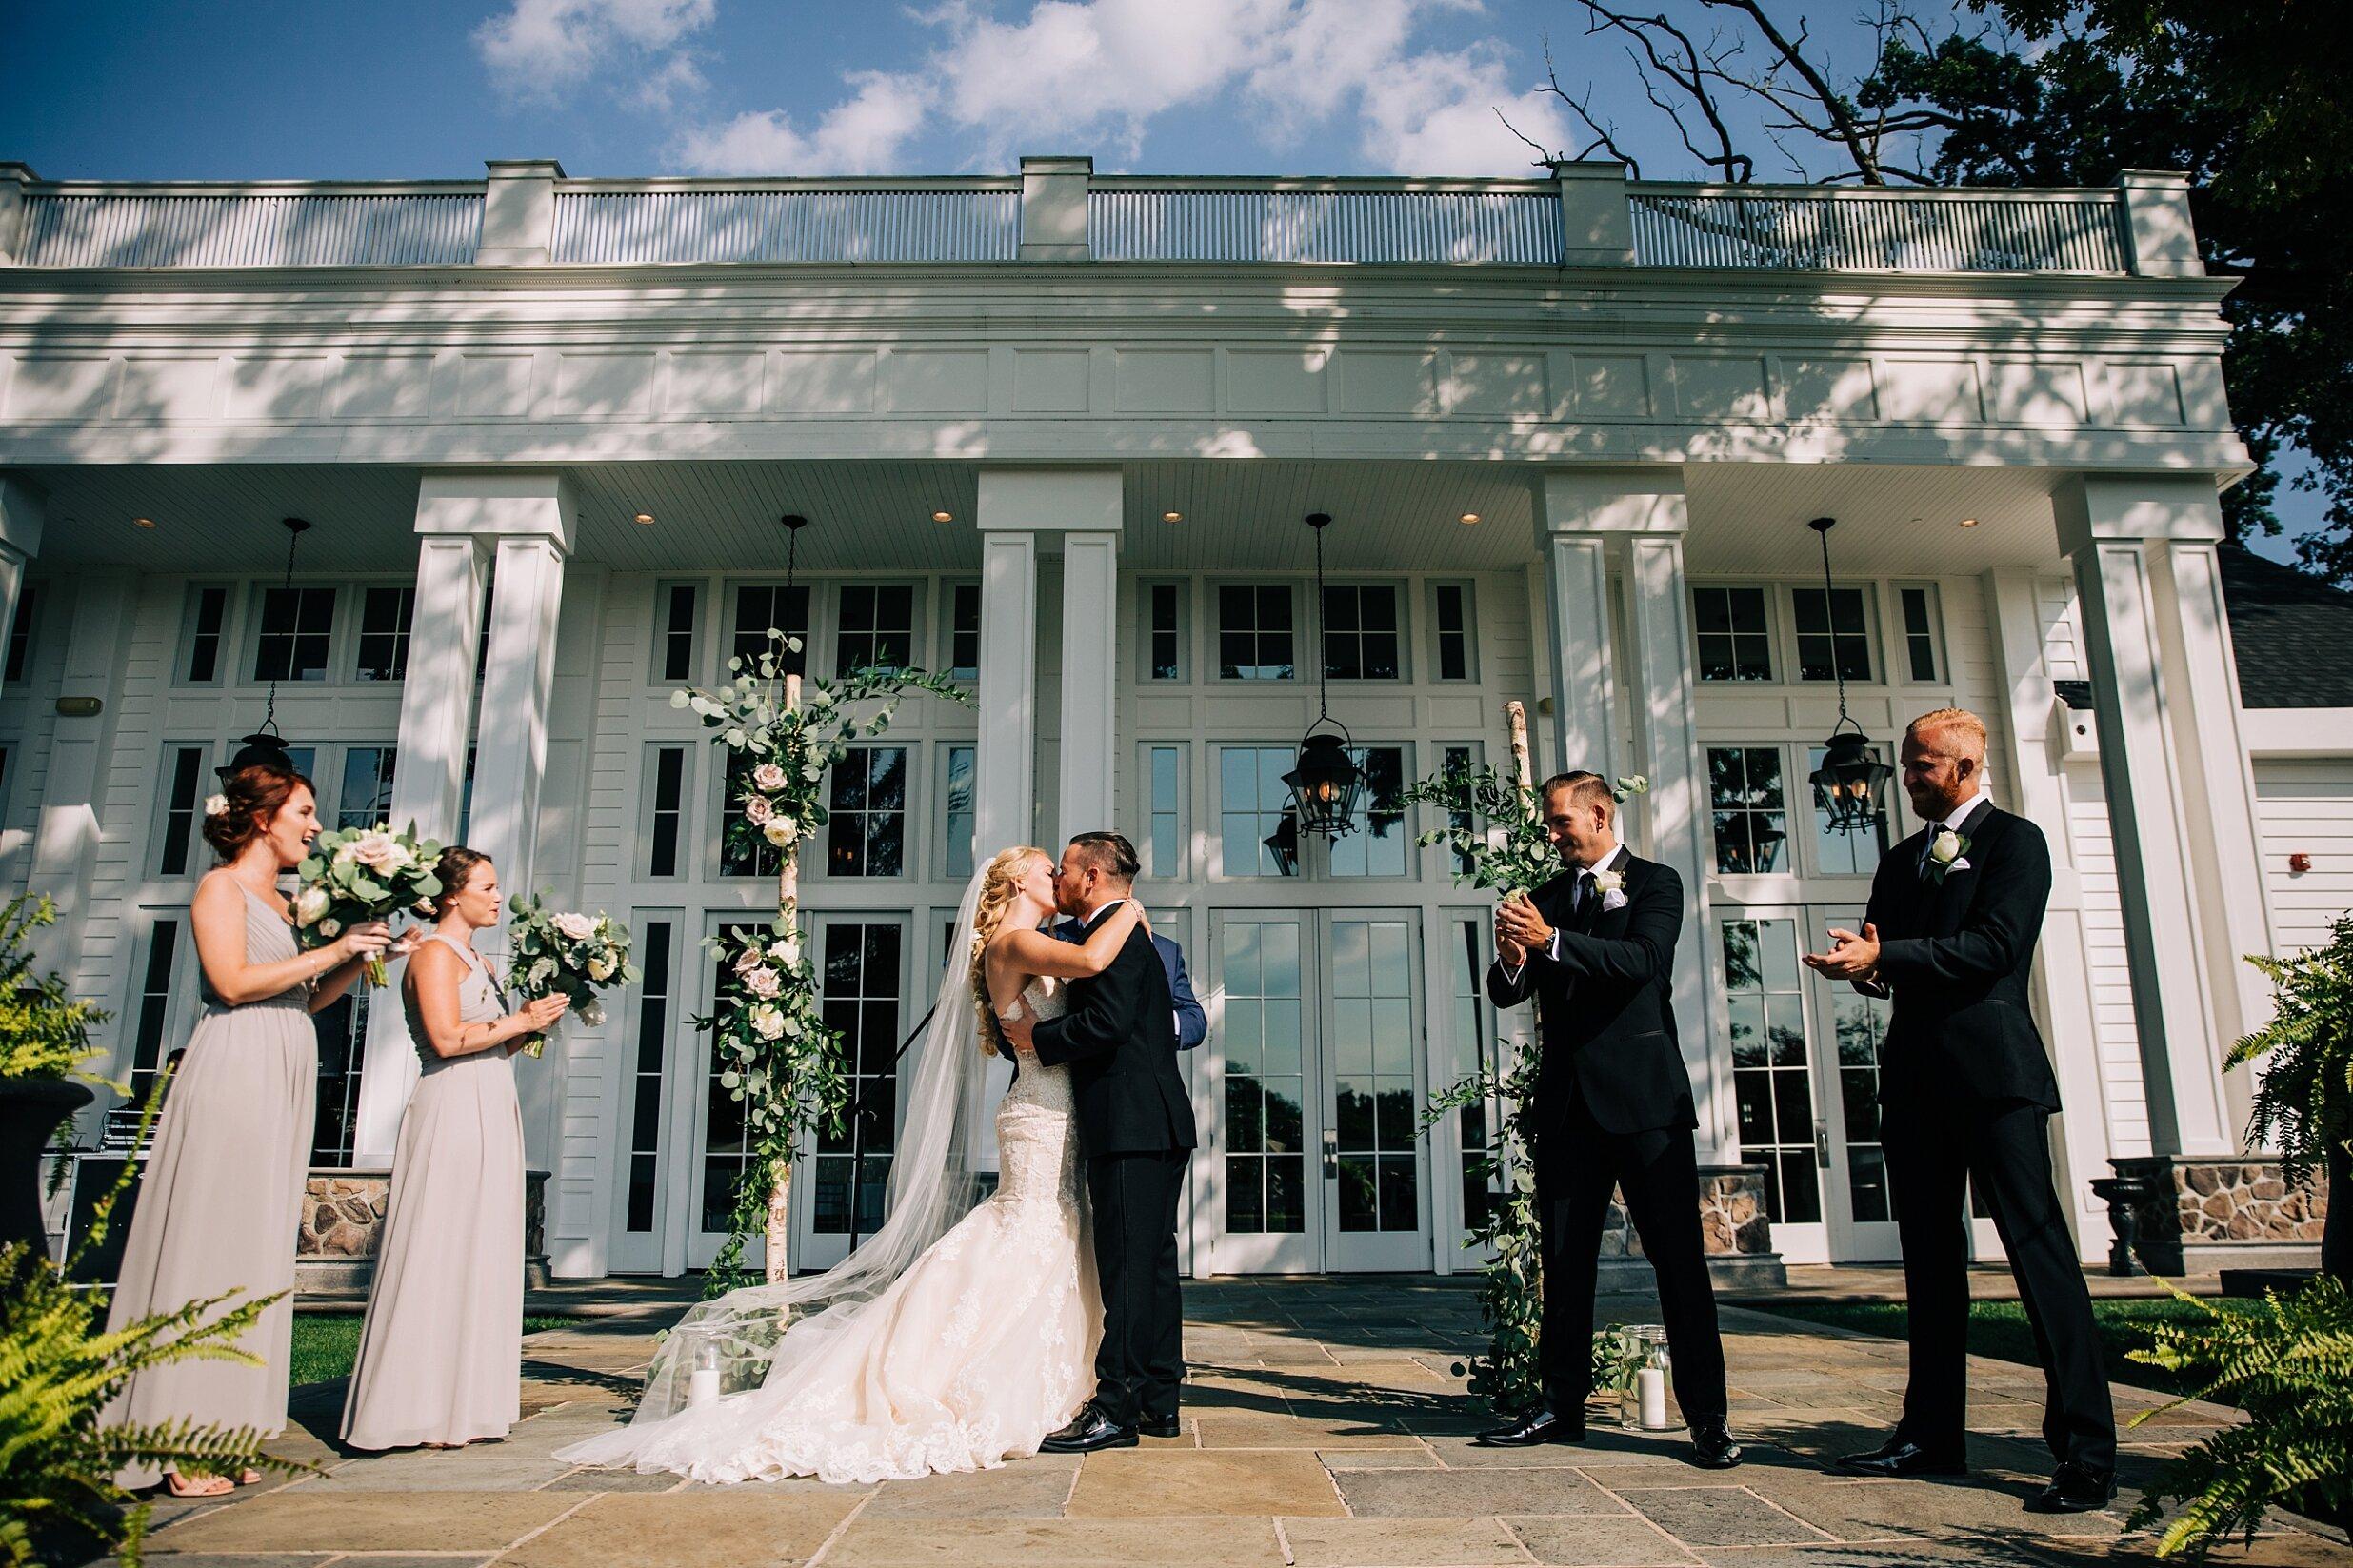 ryland-inn-nj-photographer-wedding_0046.jpg